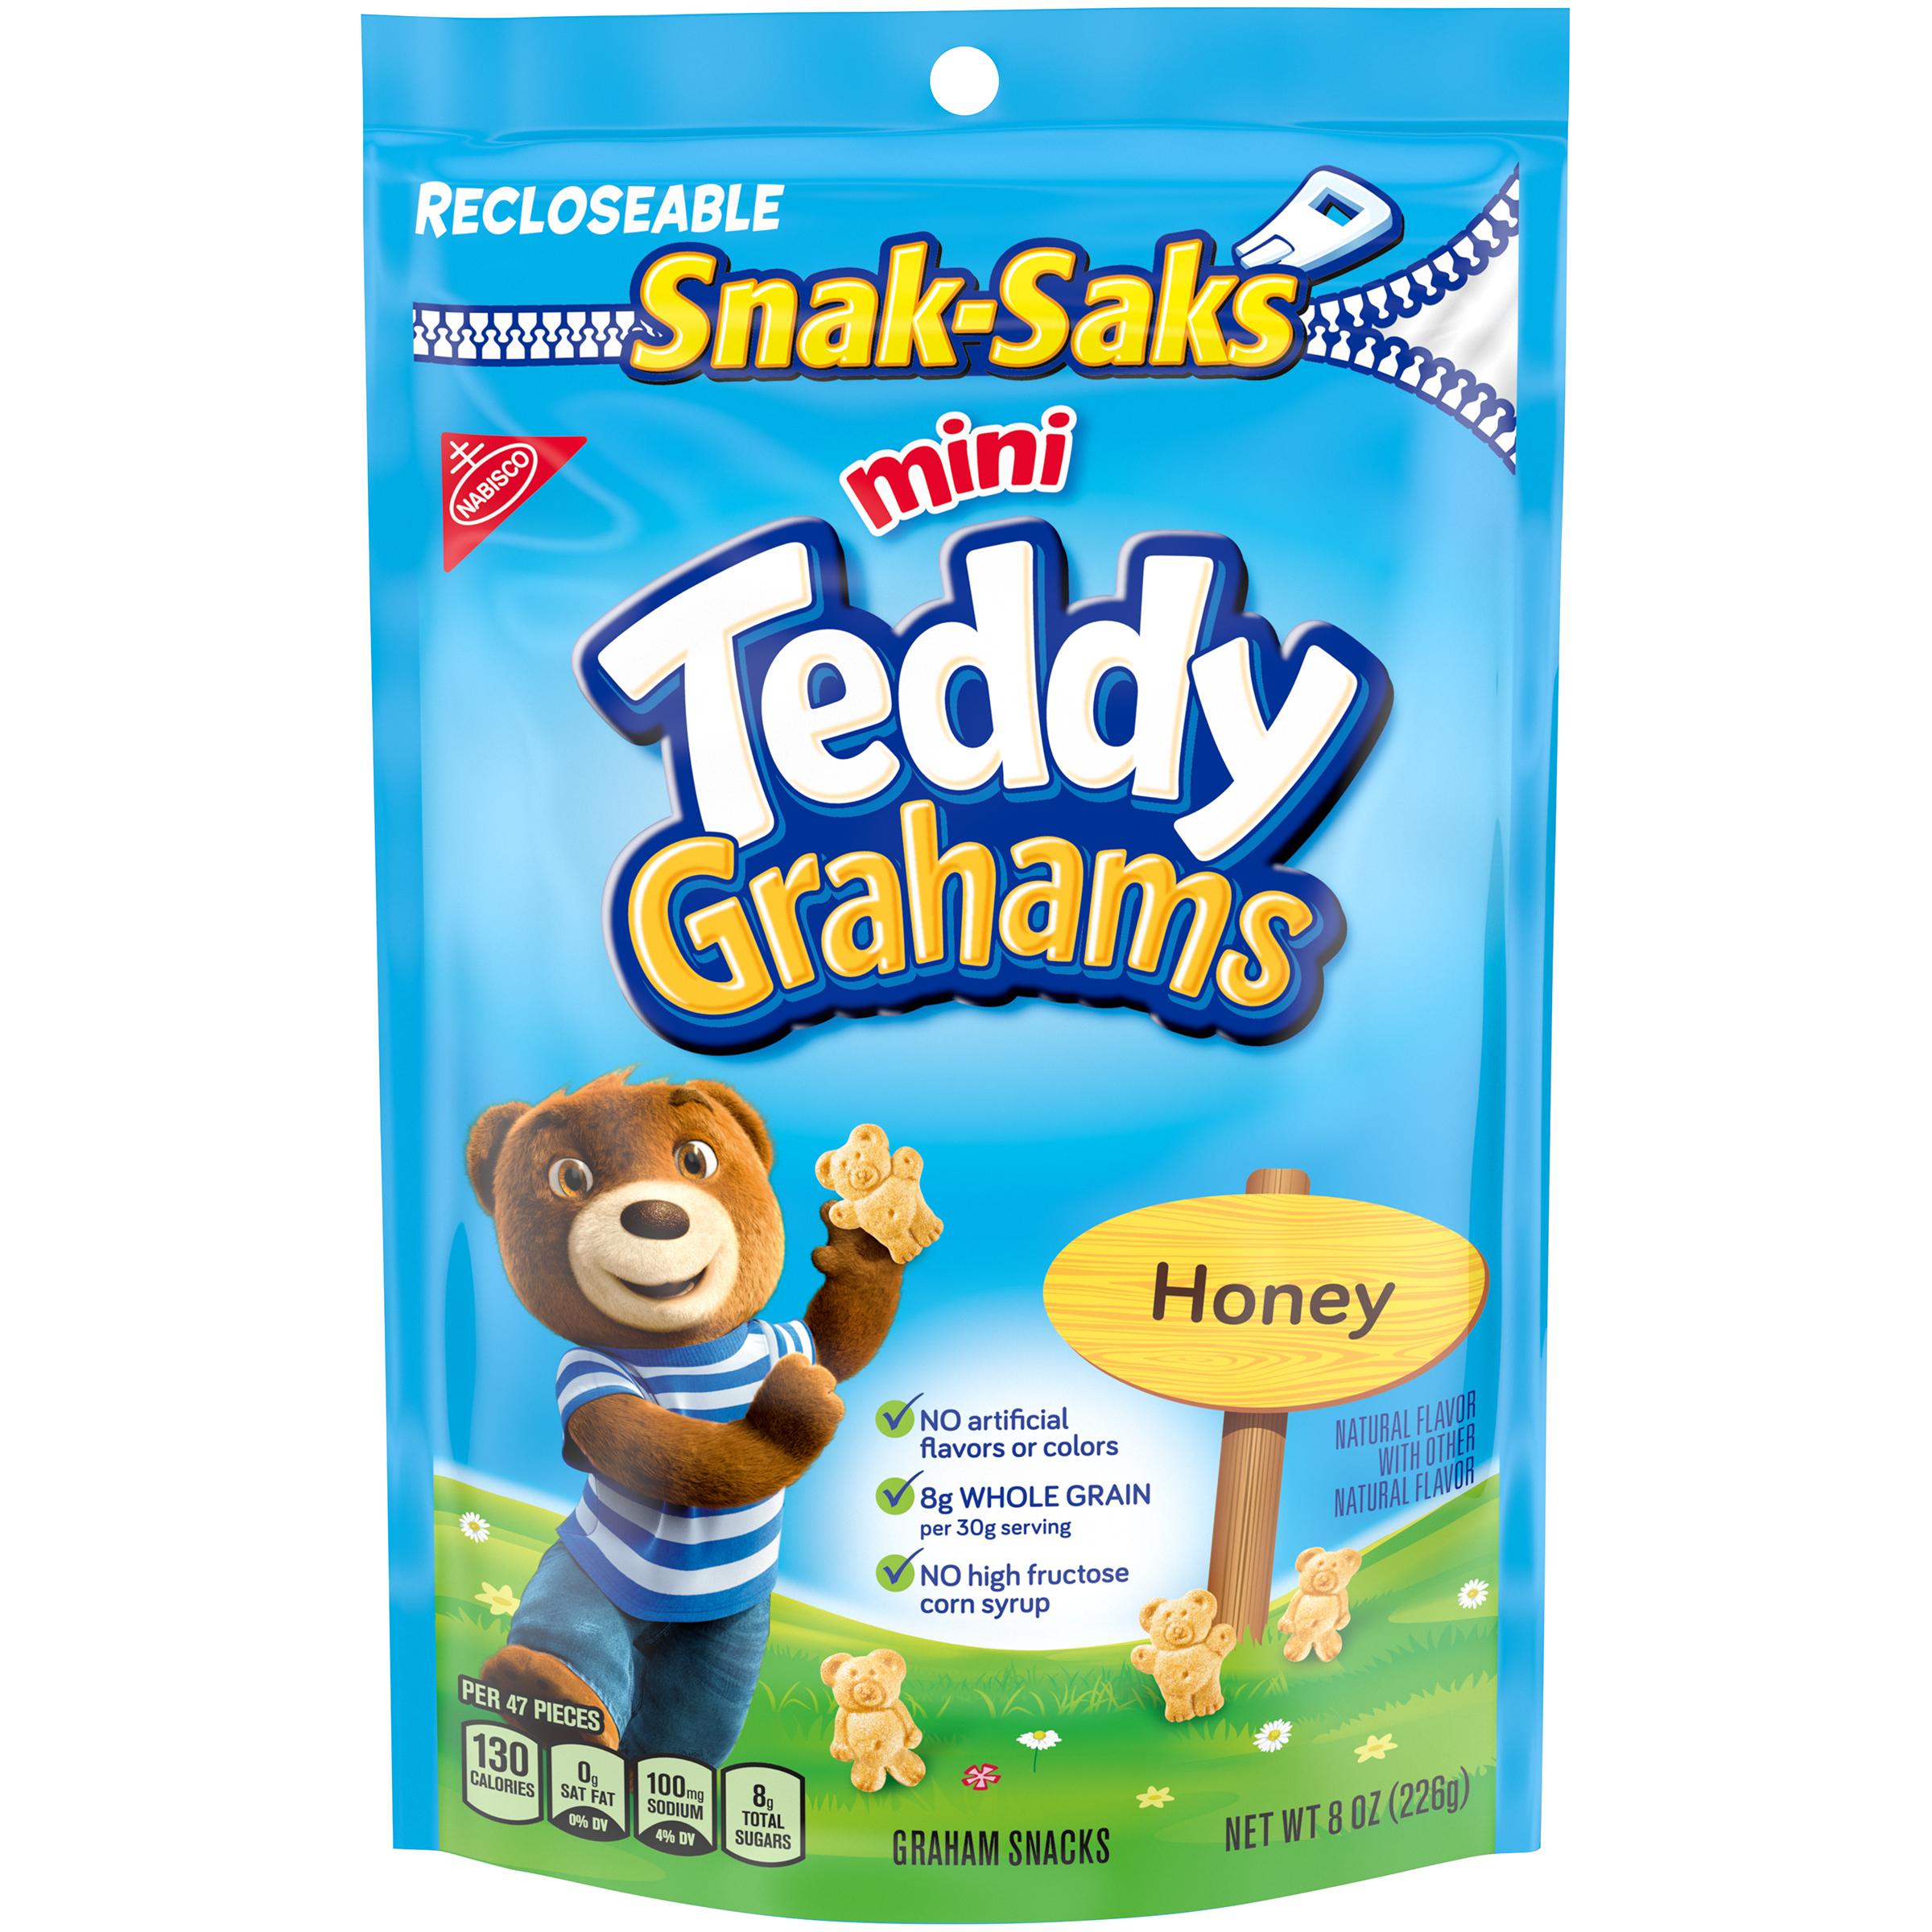 TEDDY GRAHAMS Honey Graham Lunchbox Cookies Snak Saks 8 oz